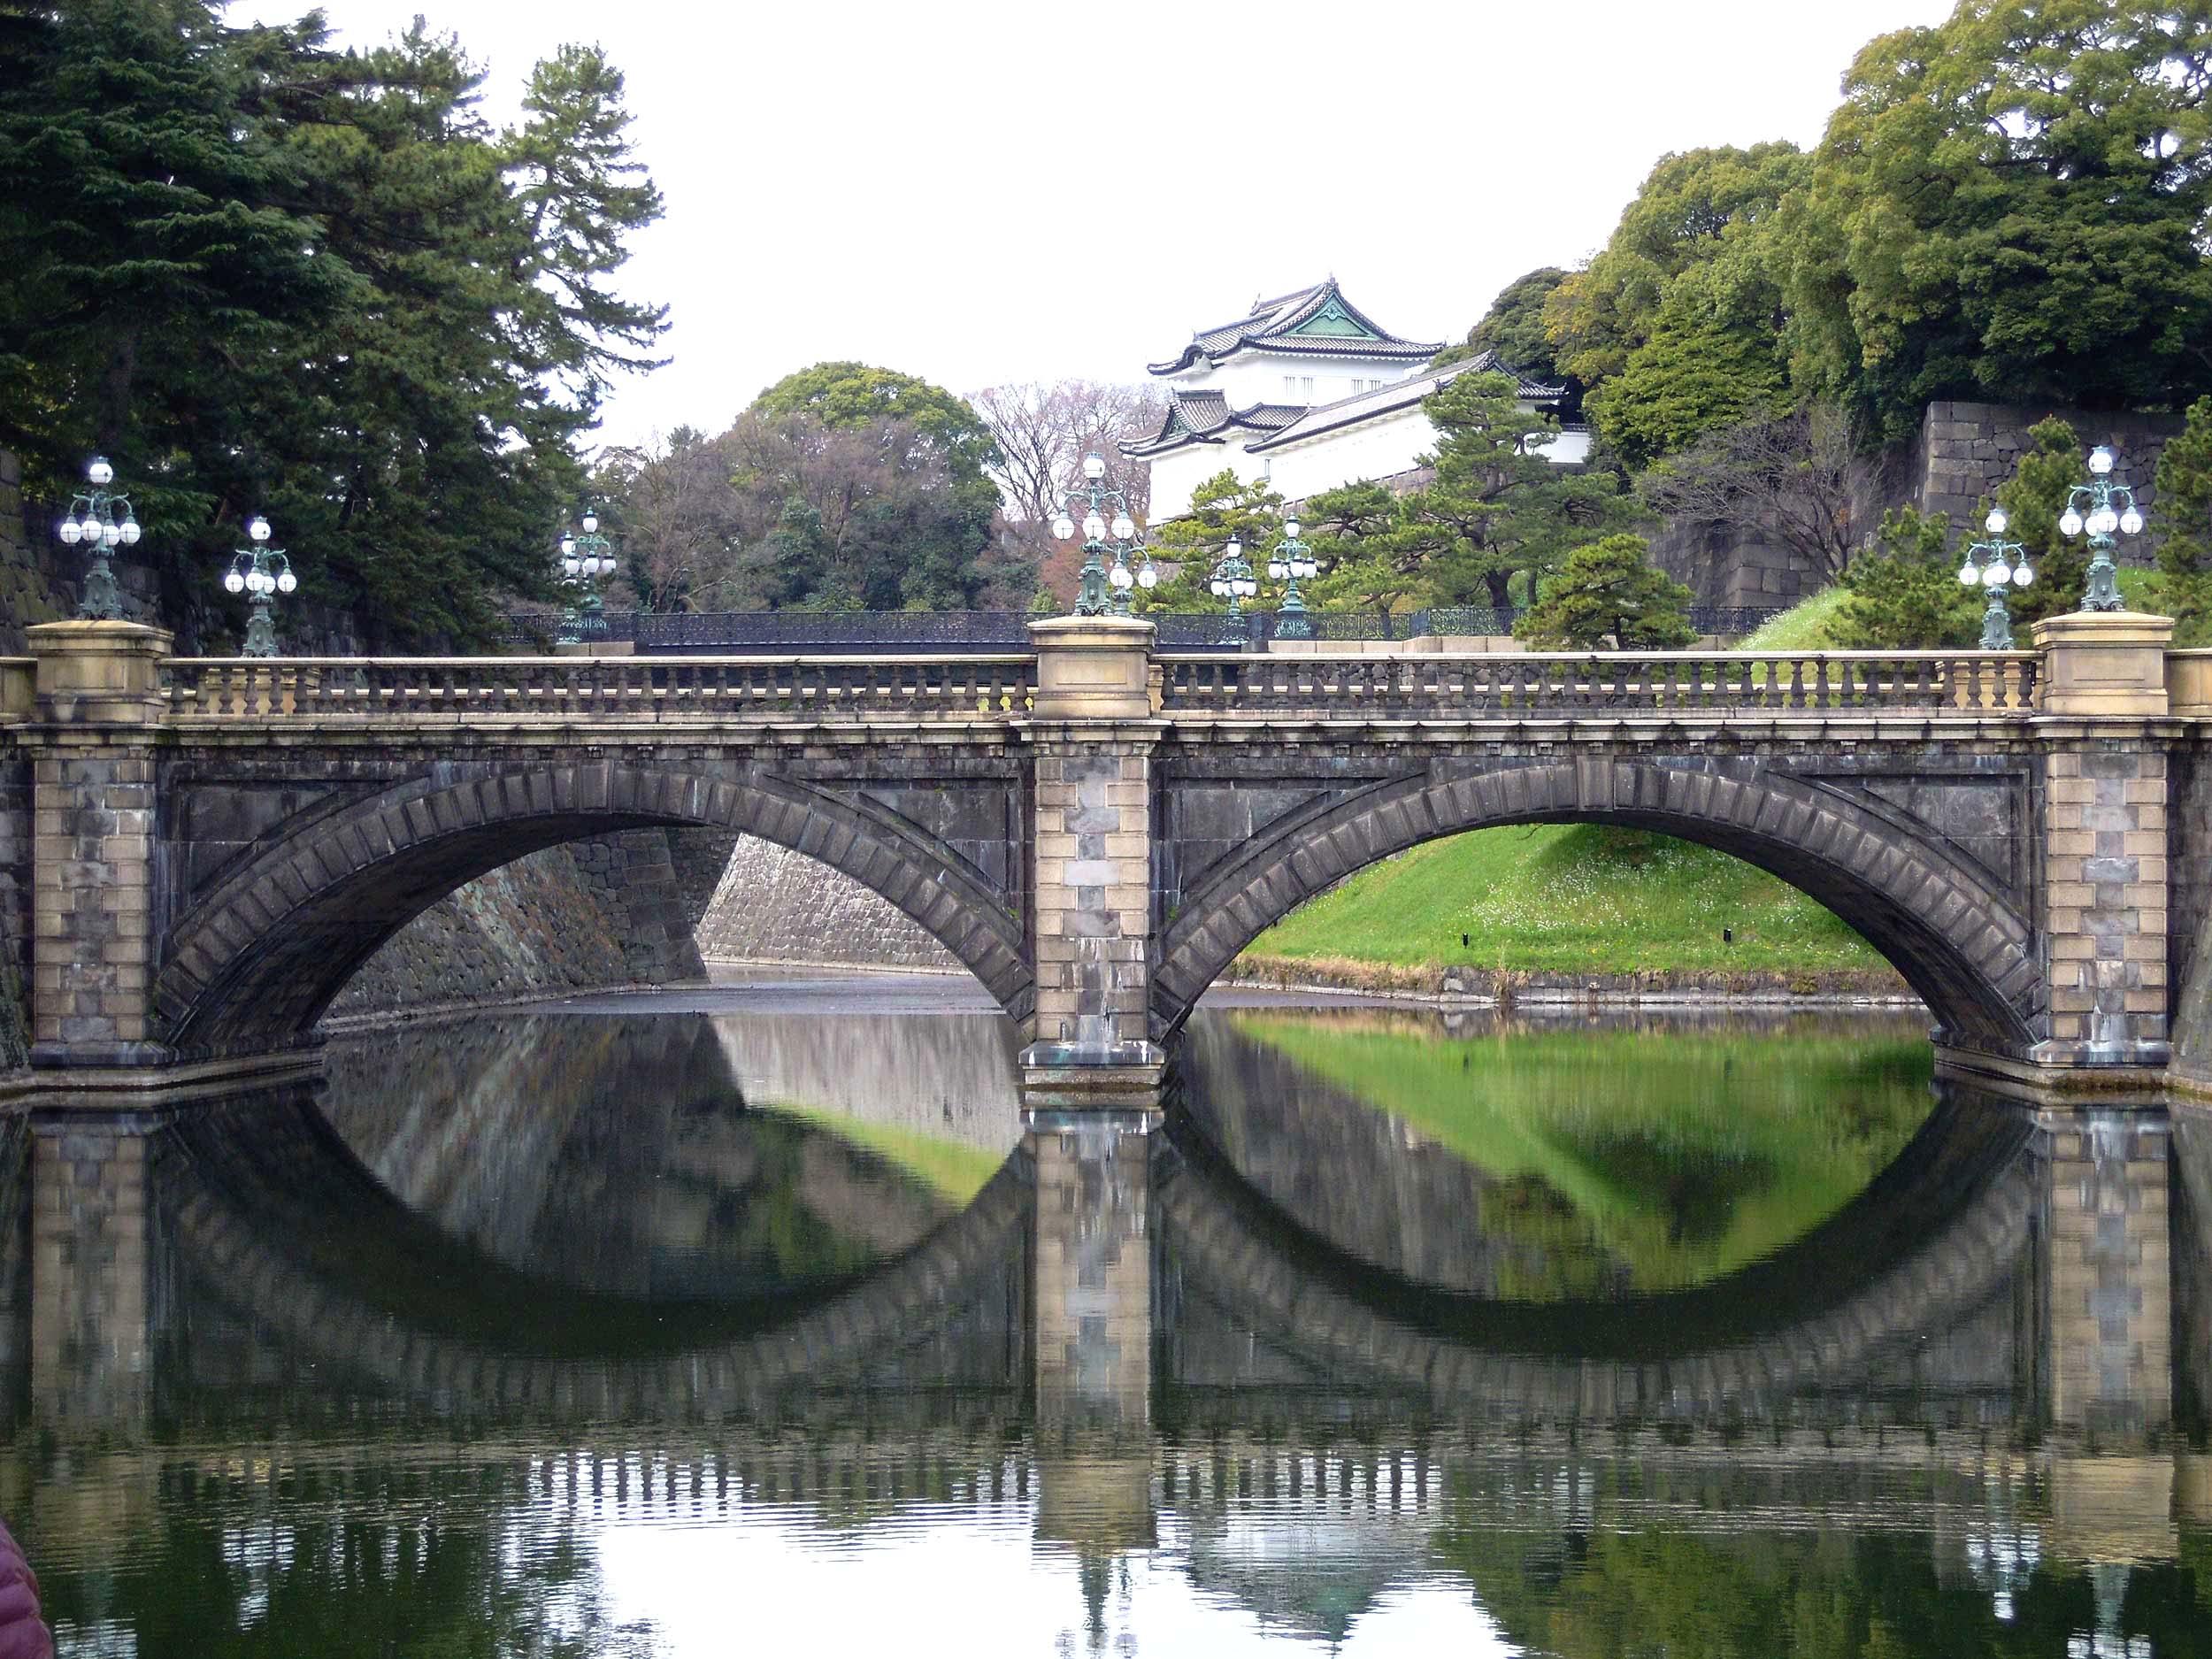 پل مگانباشی (Meganebashi) یا پل عینک